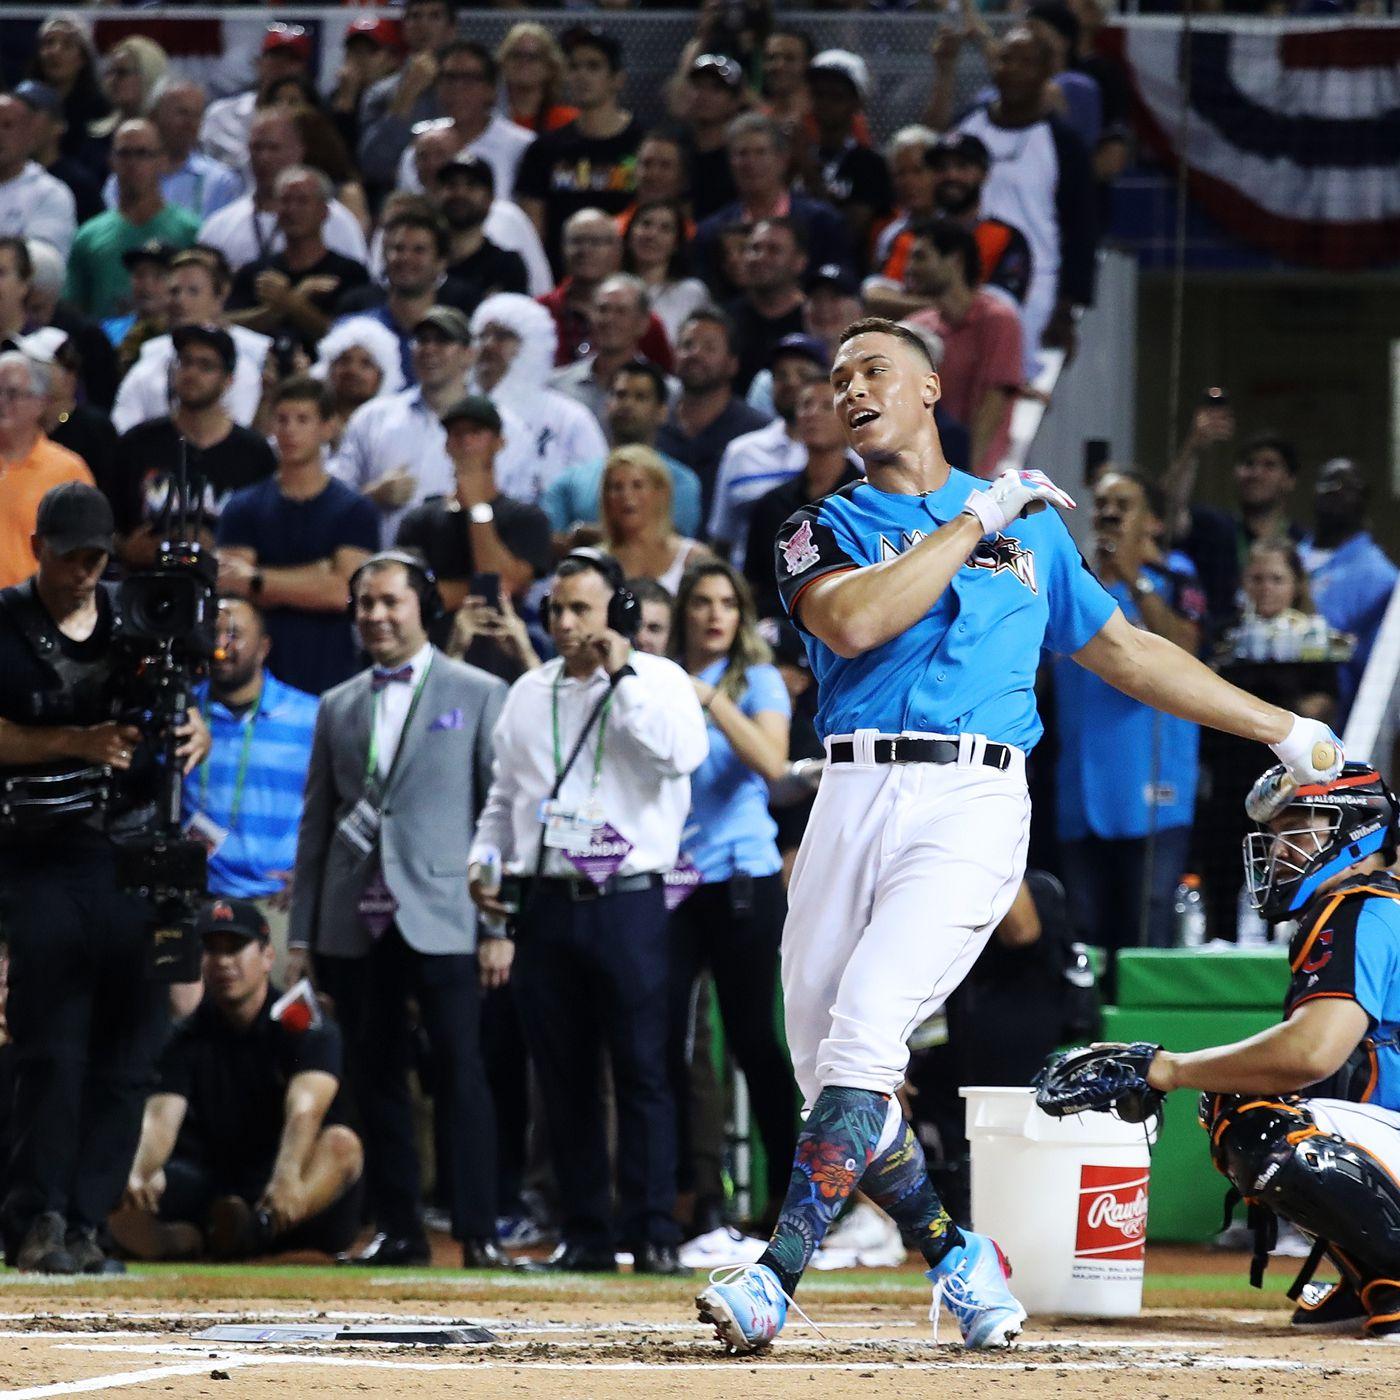 wins MLB's 2017 Home Run Derby ...